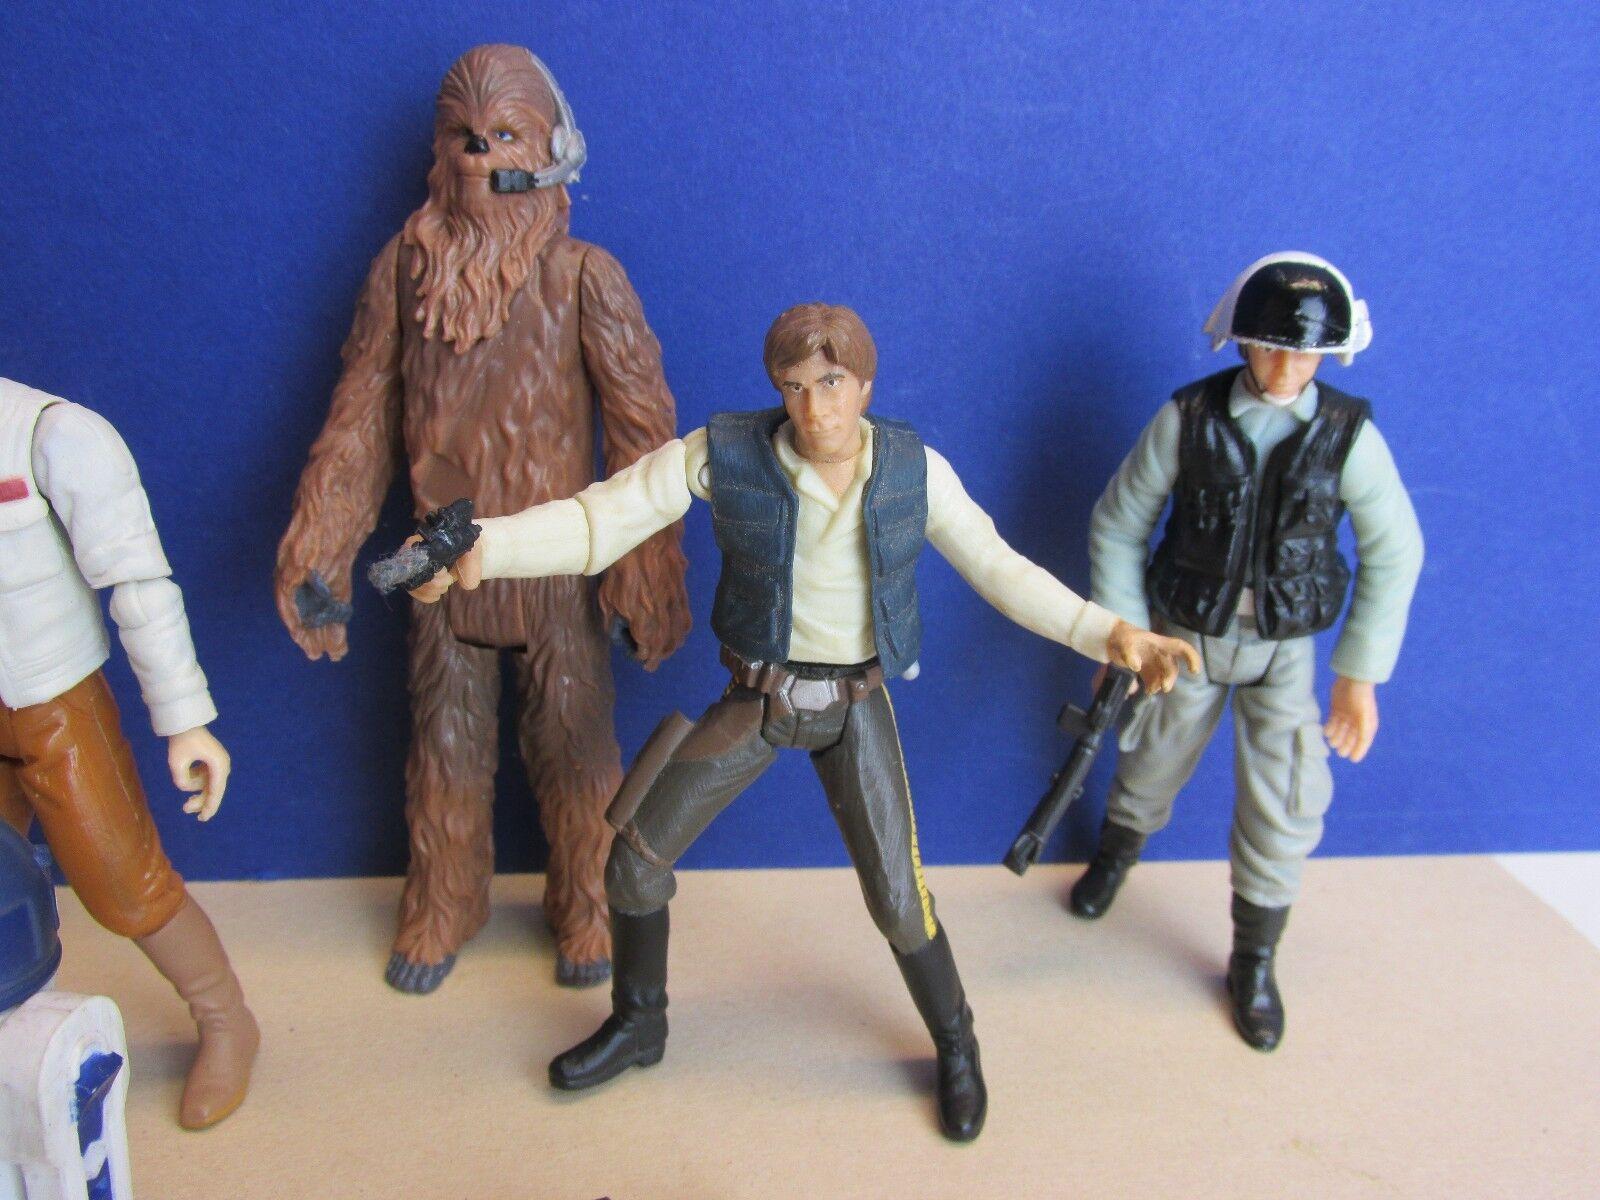 STAR Wars rossoj rossoj rossoj action figure Darth Vader Luke Han Chewie Trooper r2 d2 Set F45 2c7861